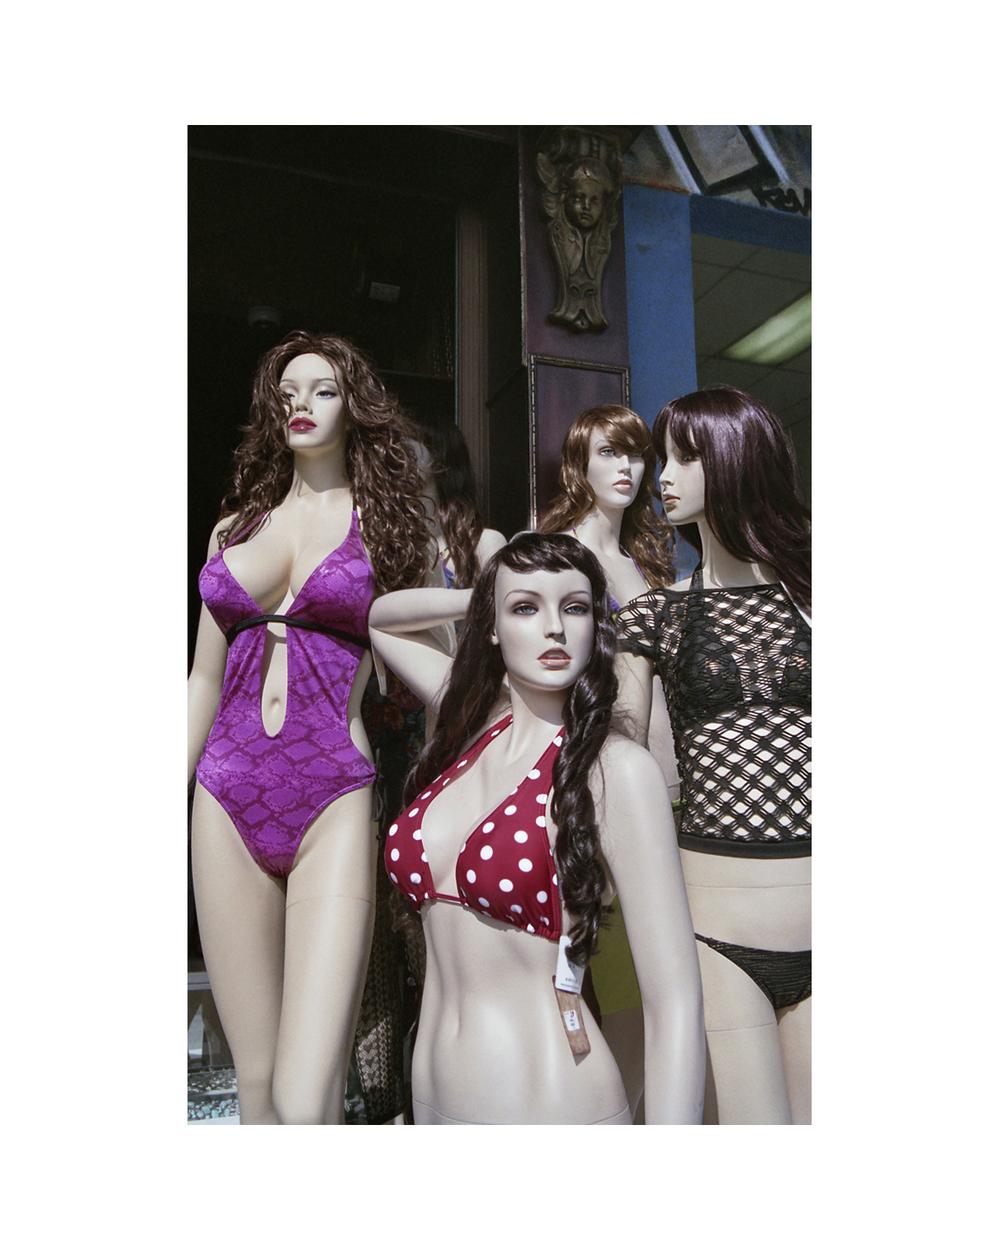 Mannequins - Venice Beach, CA